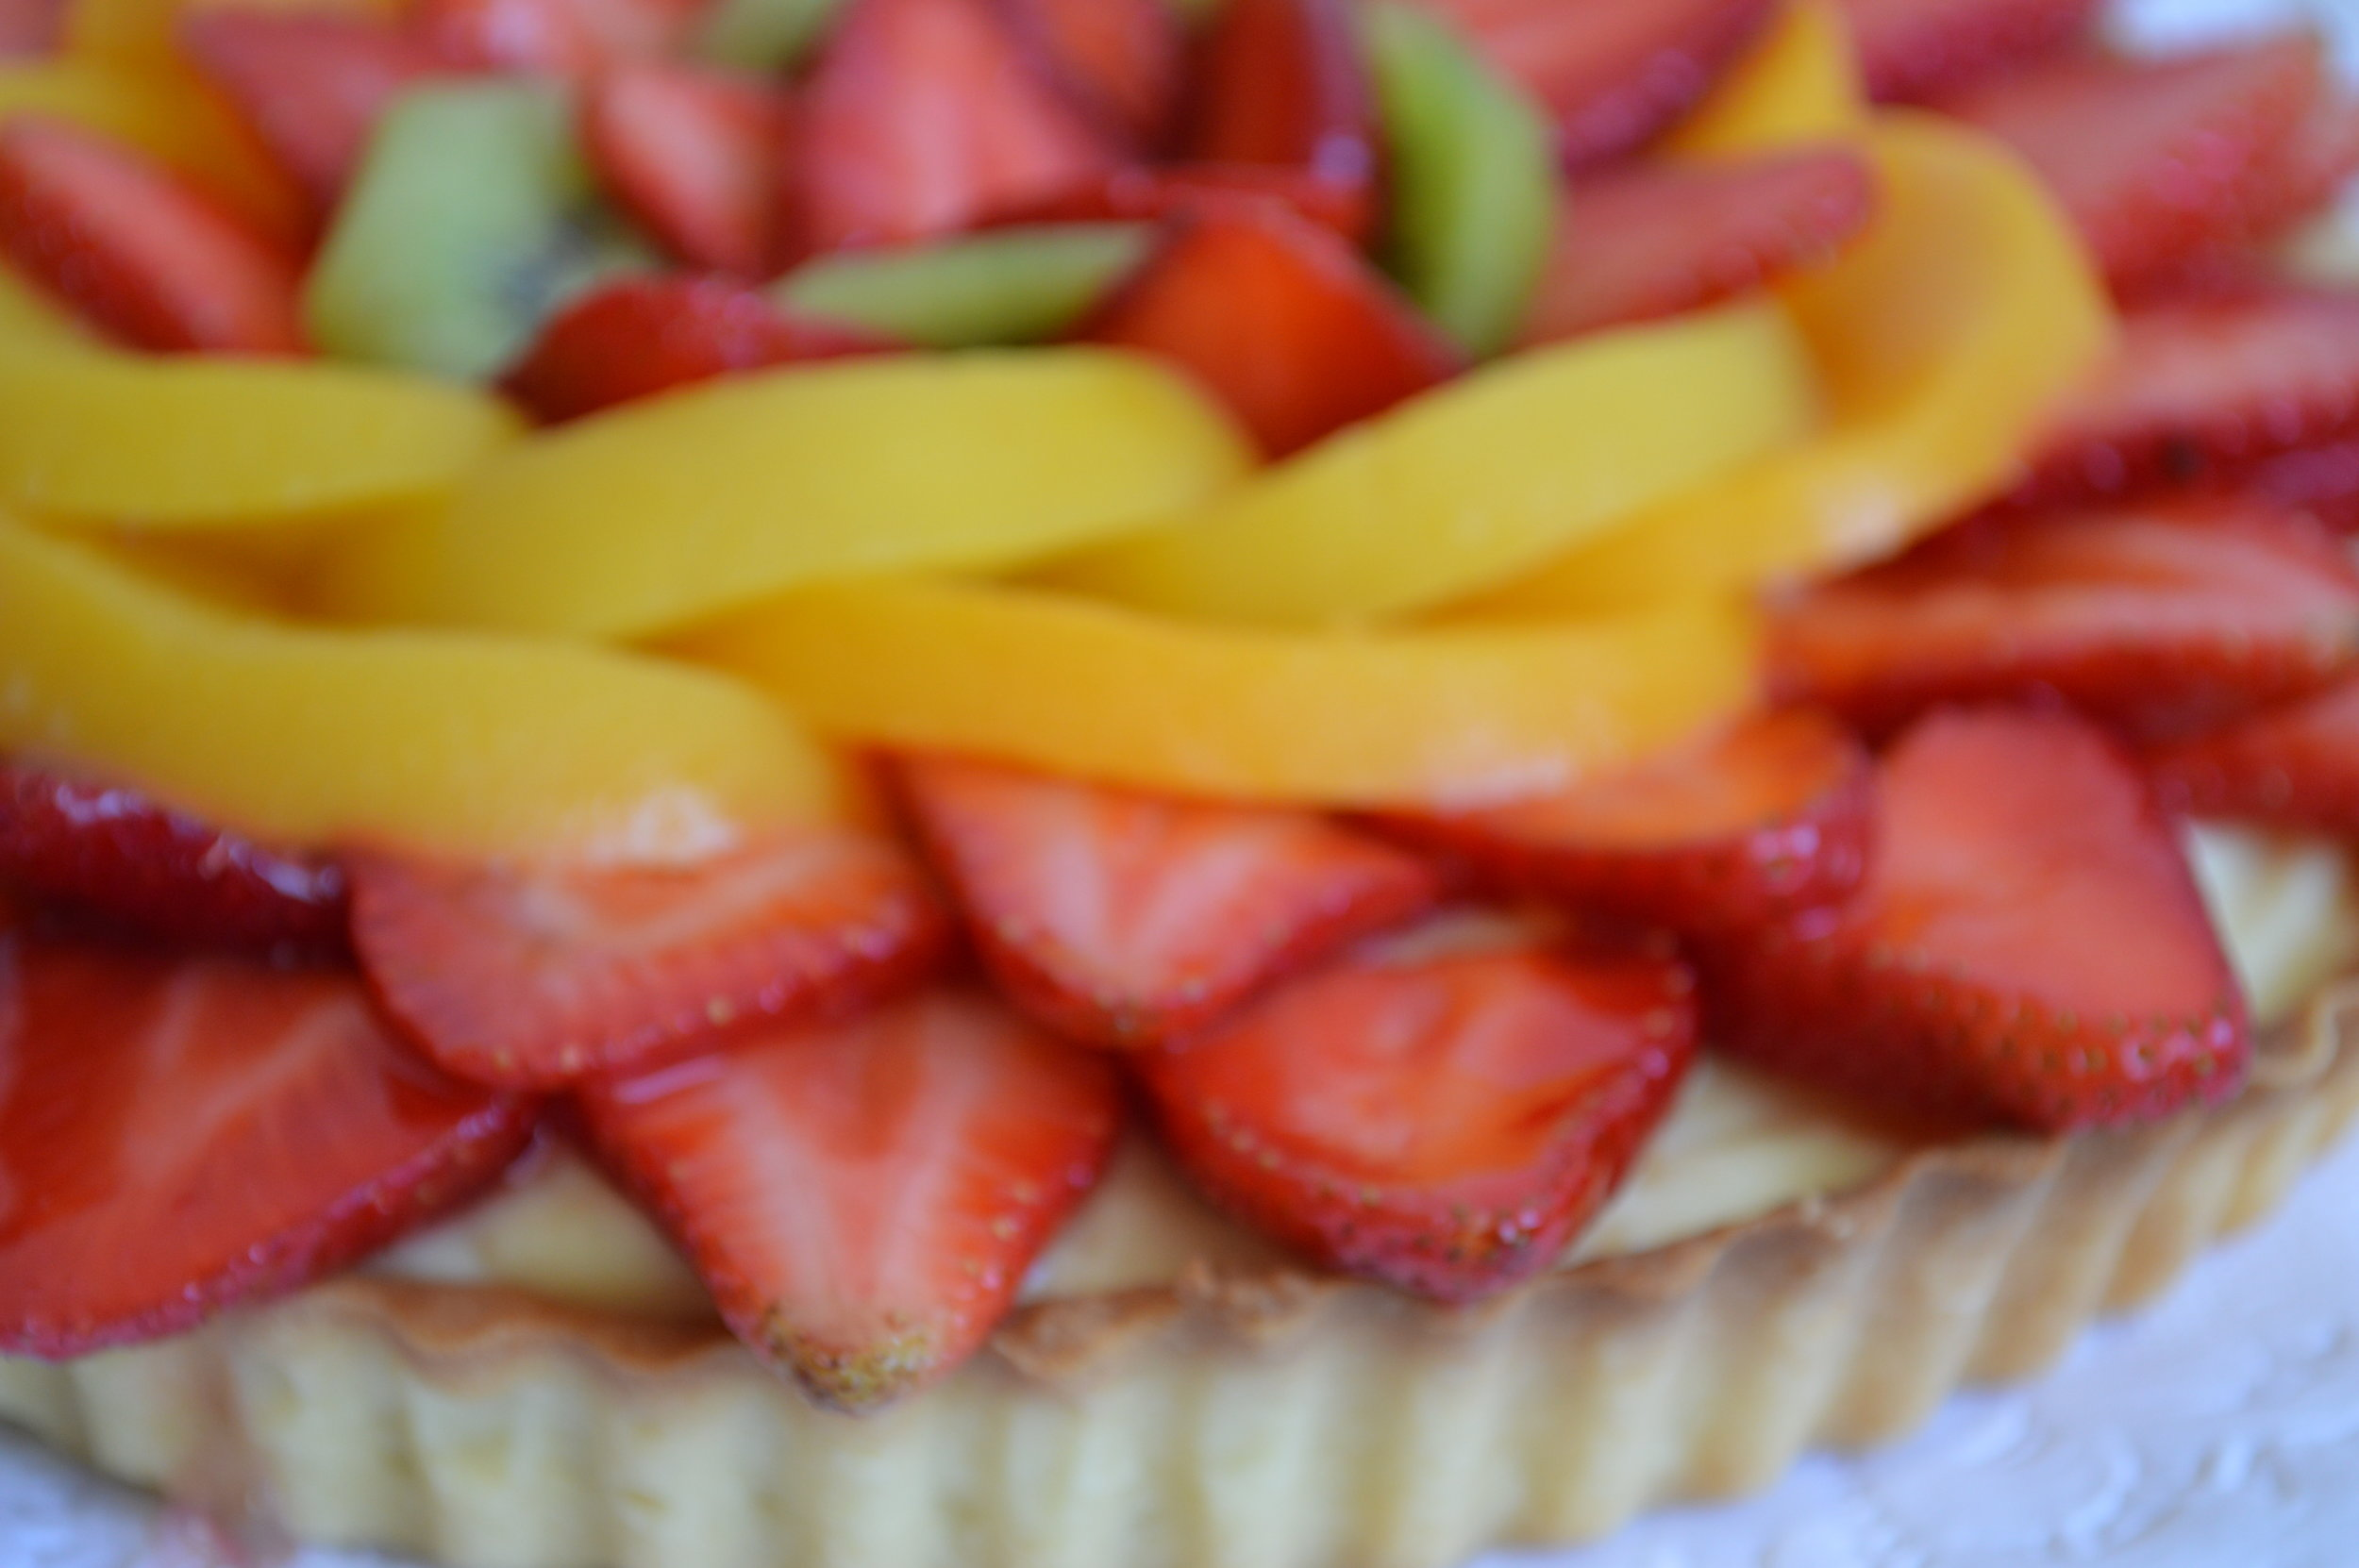 Fruit Pie recipe here